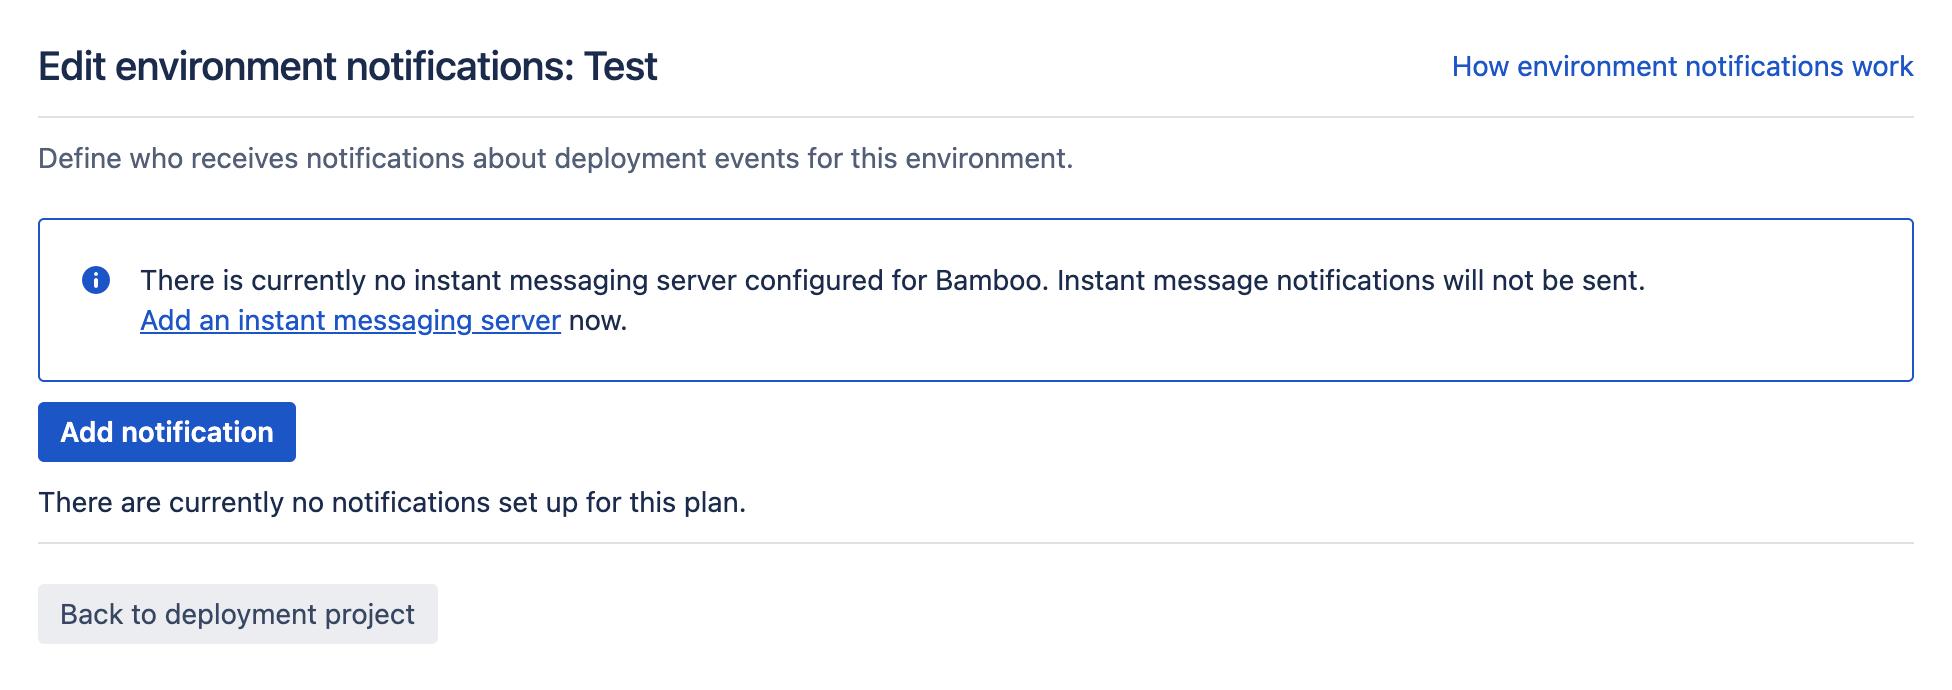 Notification setup screen for deployment environment